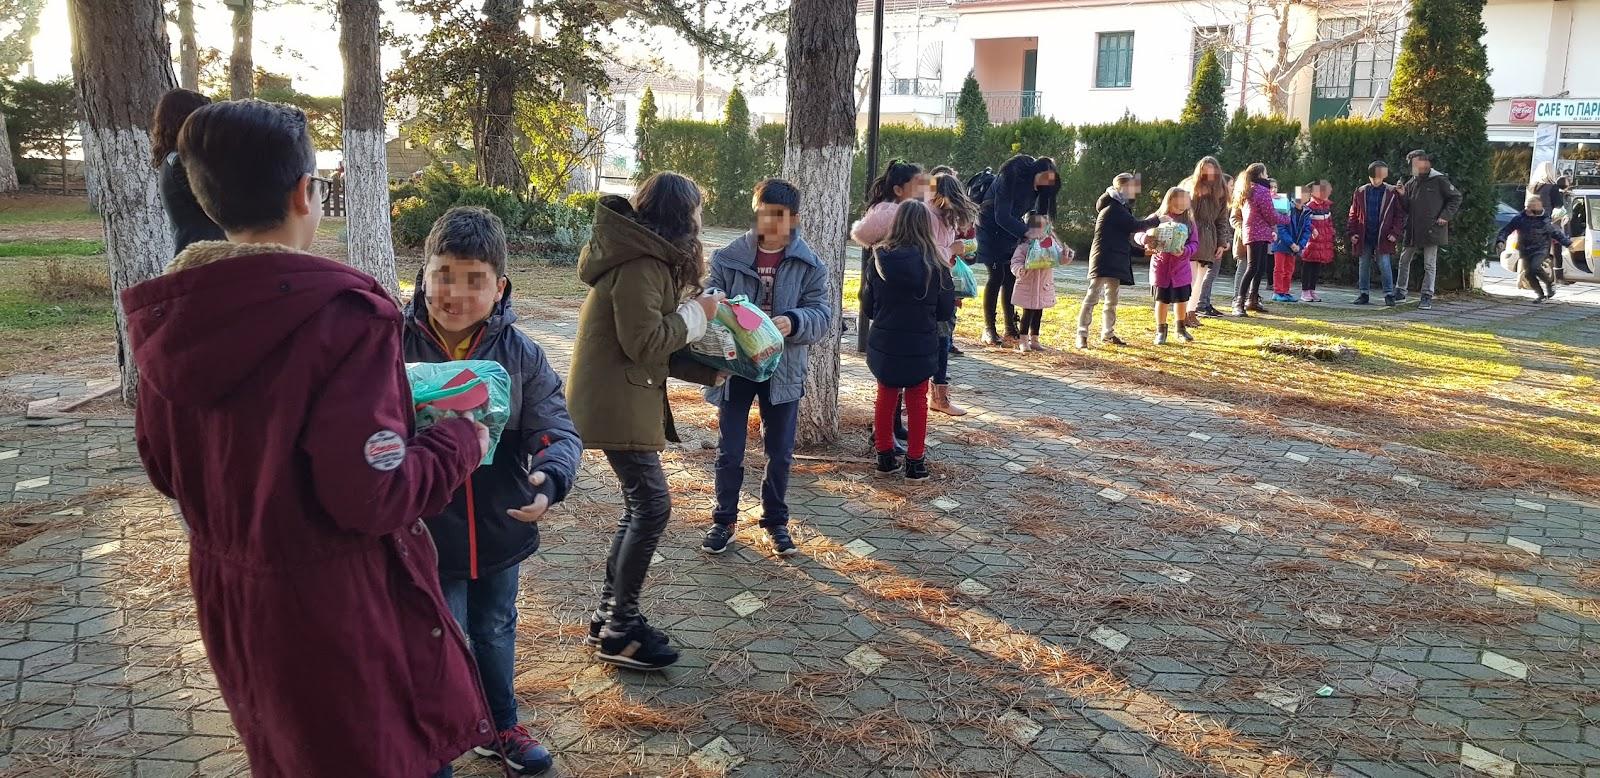 efd8066282 Την Πέμπτη και την Παρασκευή 20 και 21 Δεκεμβρίου πραγματοποιήθηκαν οι  Χριστουγεννιάτικες εκδηλώσεις του Κέντρου Ξένων Γλωσσών ΚΟΡΥΦΉ στο Αμύνταιο  και τις ...